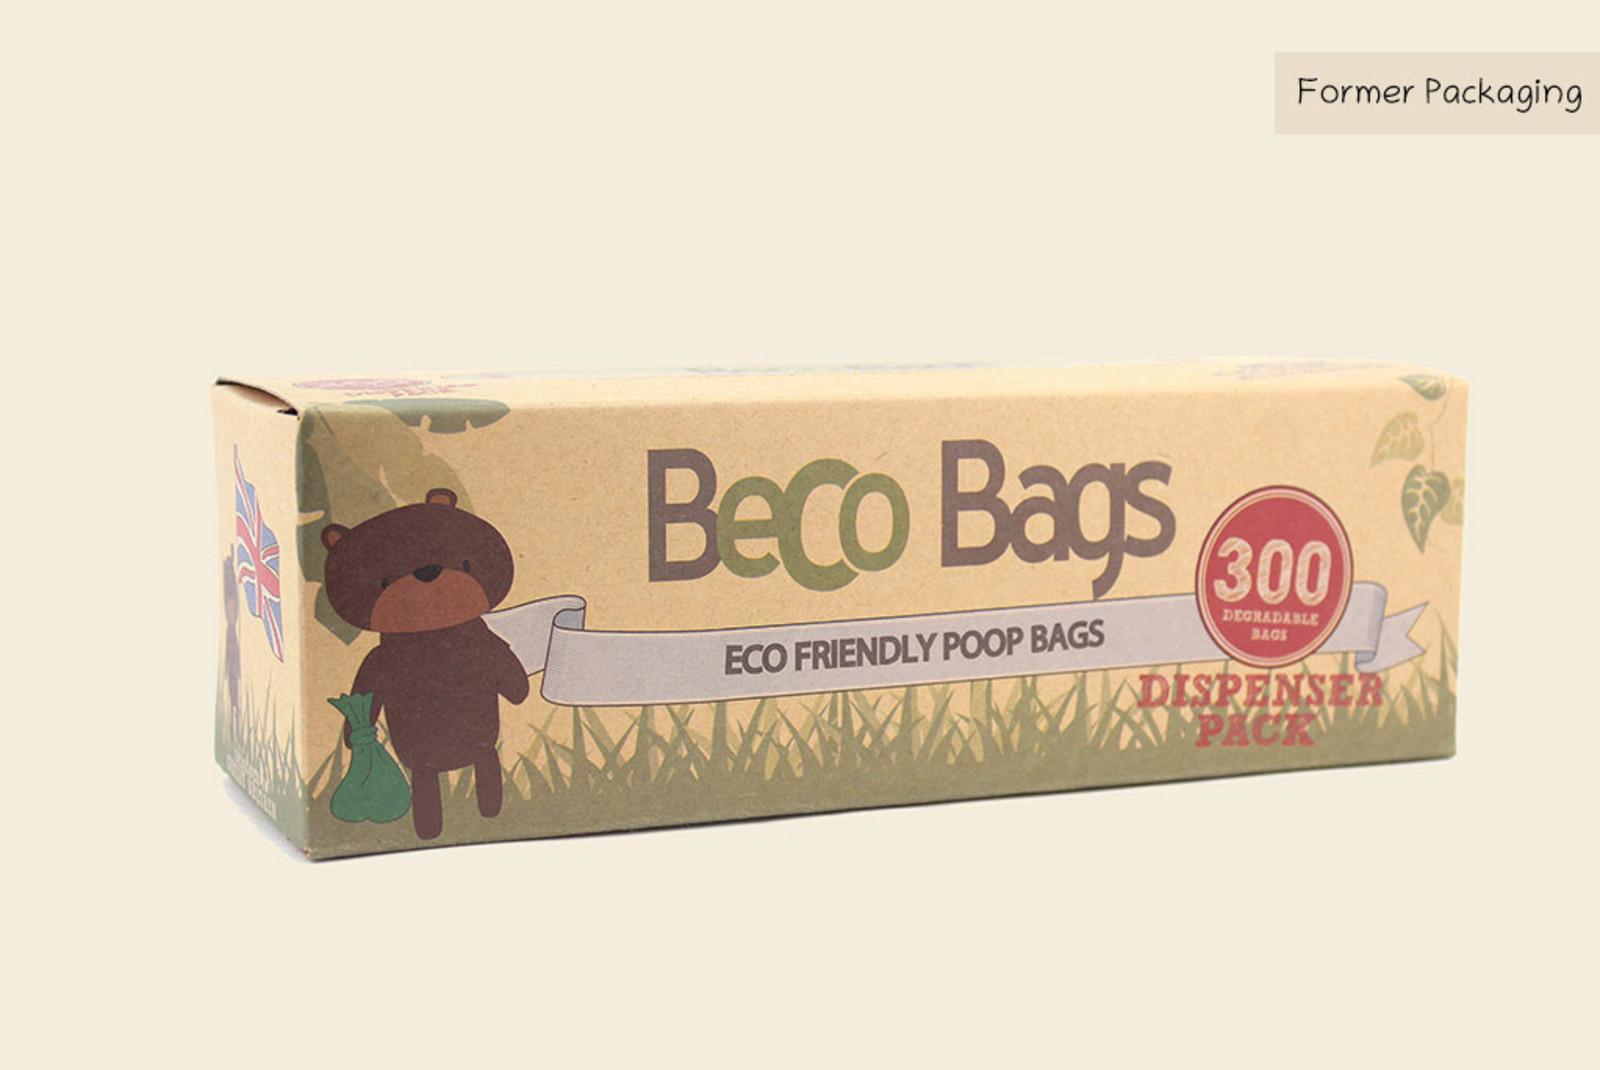 Beco Bags | Milieuvriendelijke Poepzakjes  |  Mega Dispenser